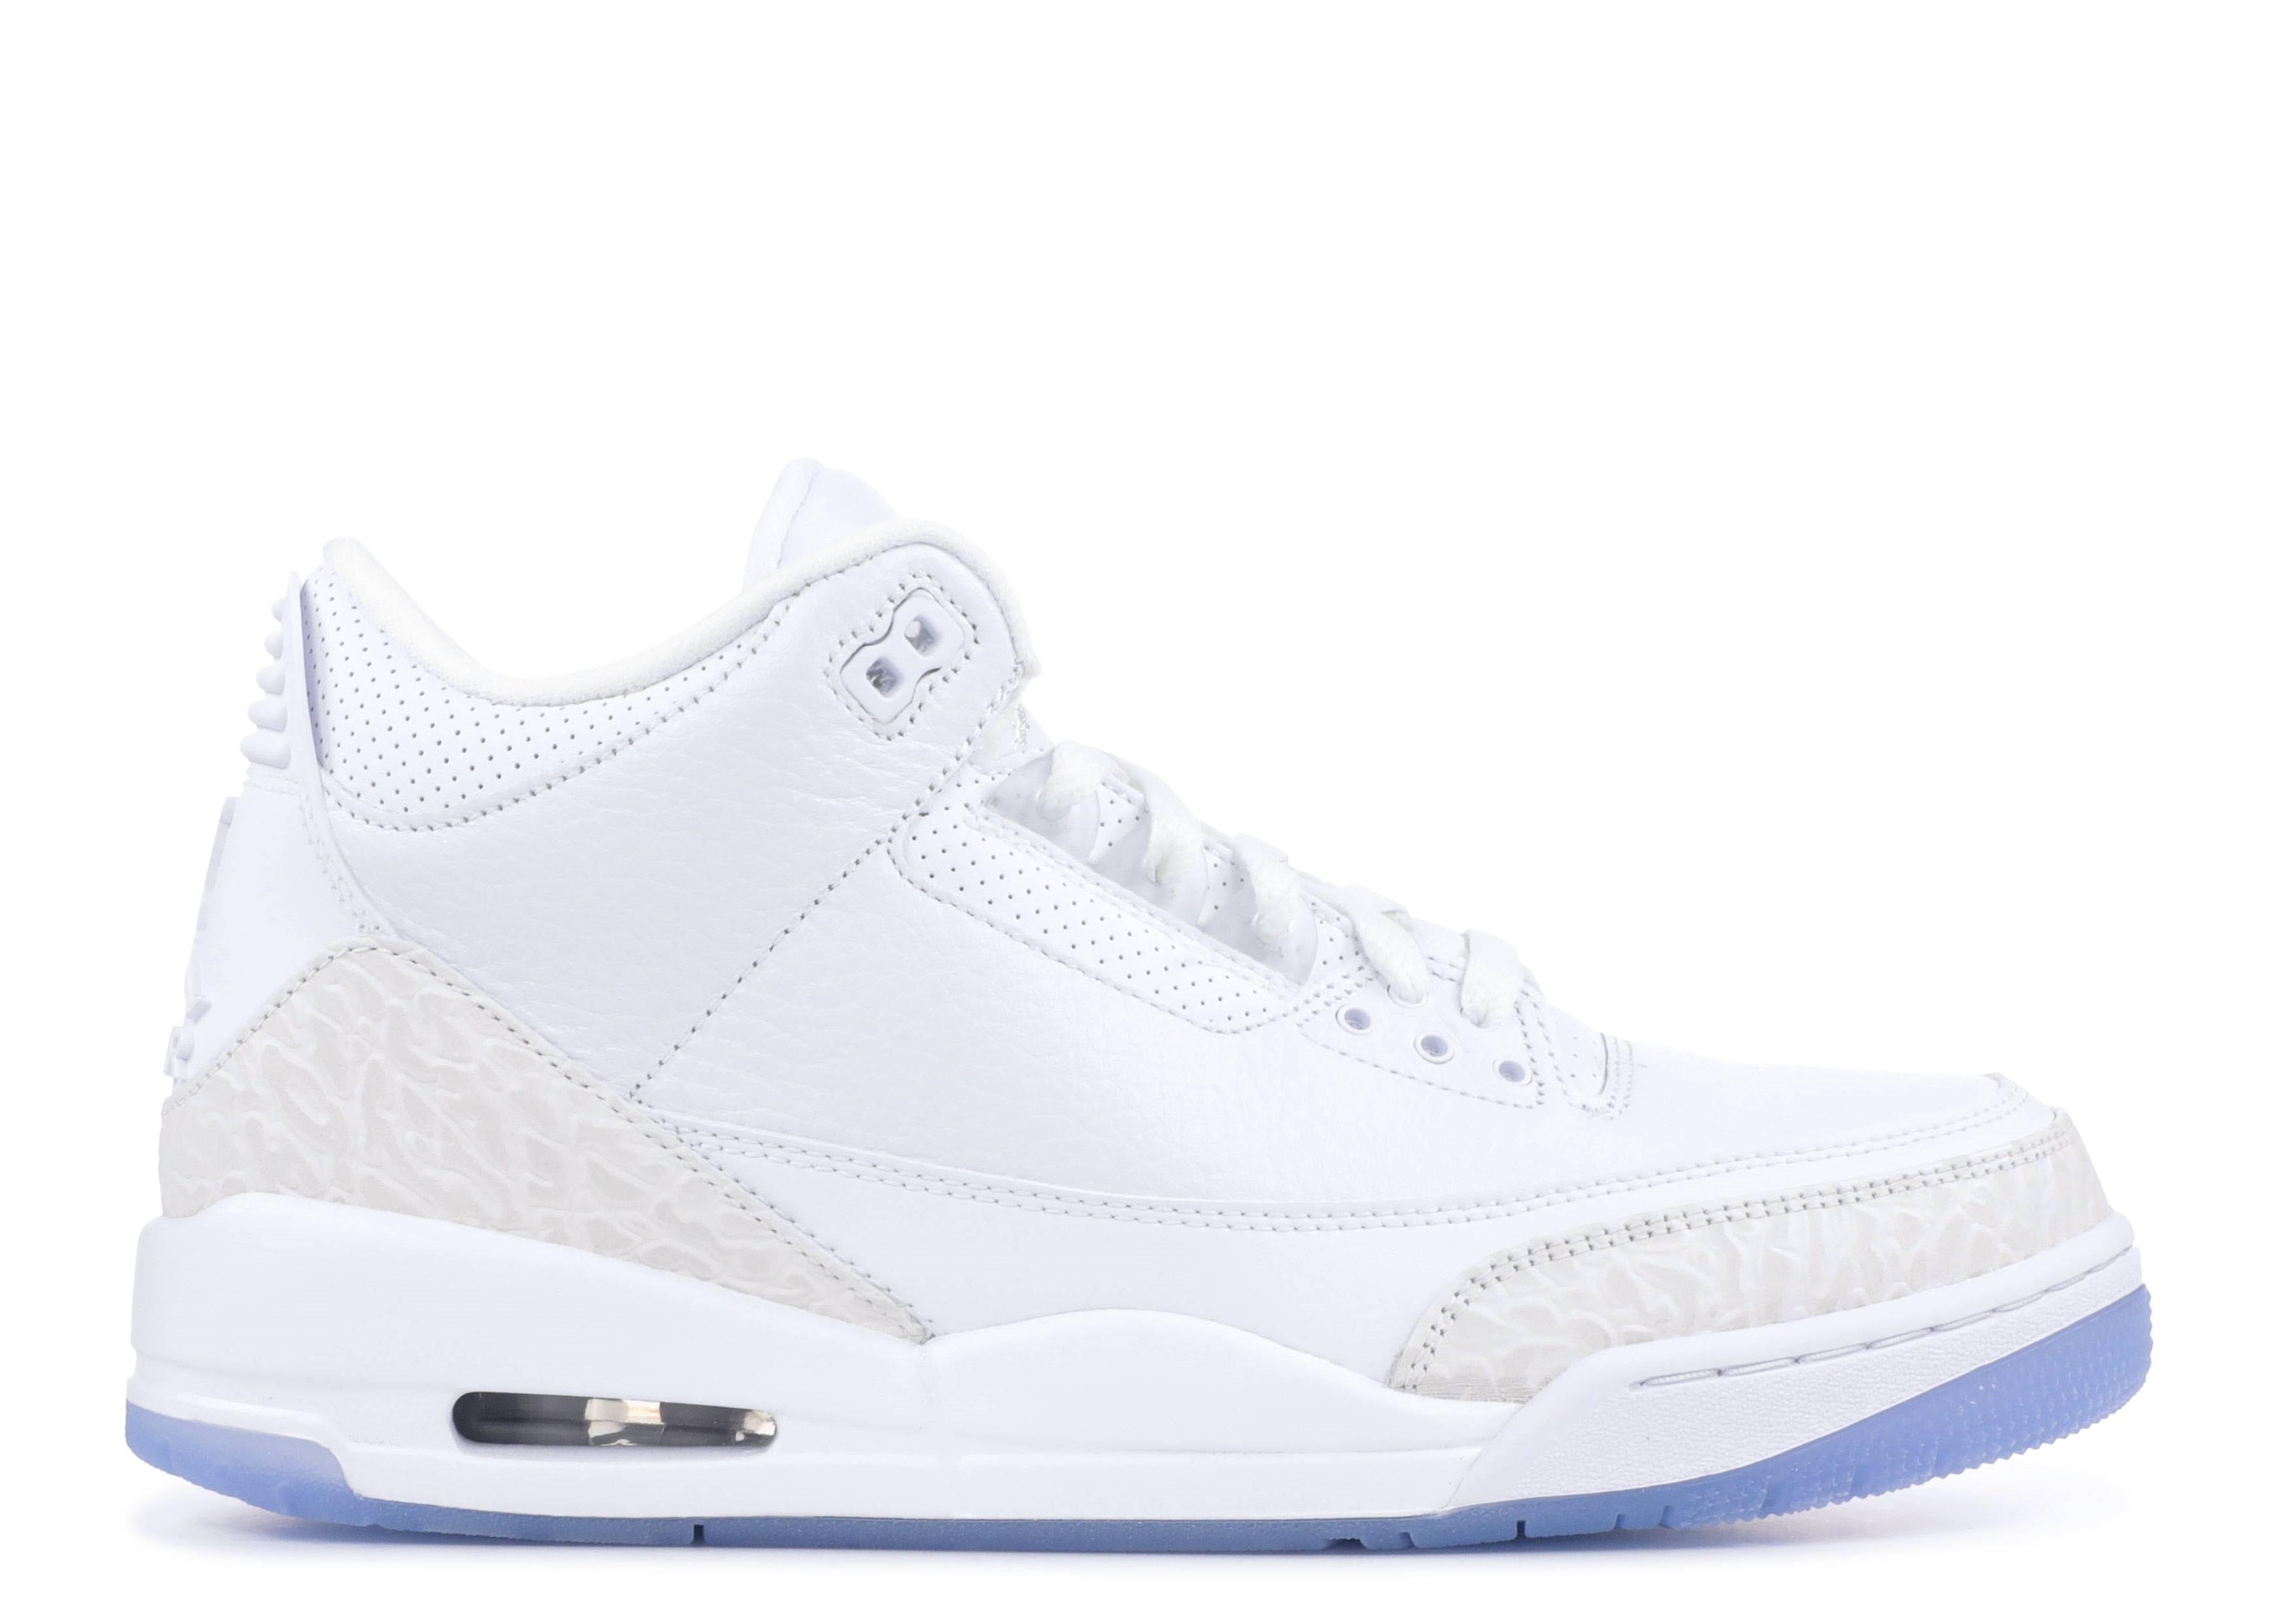 ba0517e5a45f4e Air Jordan 3 Retro - Air Jordan - 136064 111 - white white-white ...